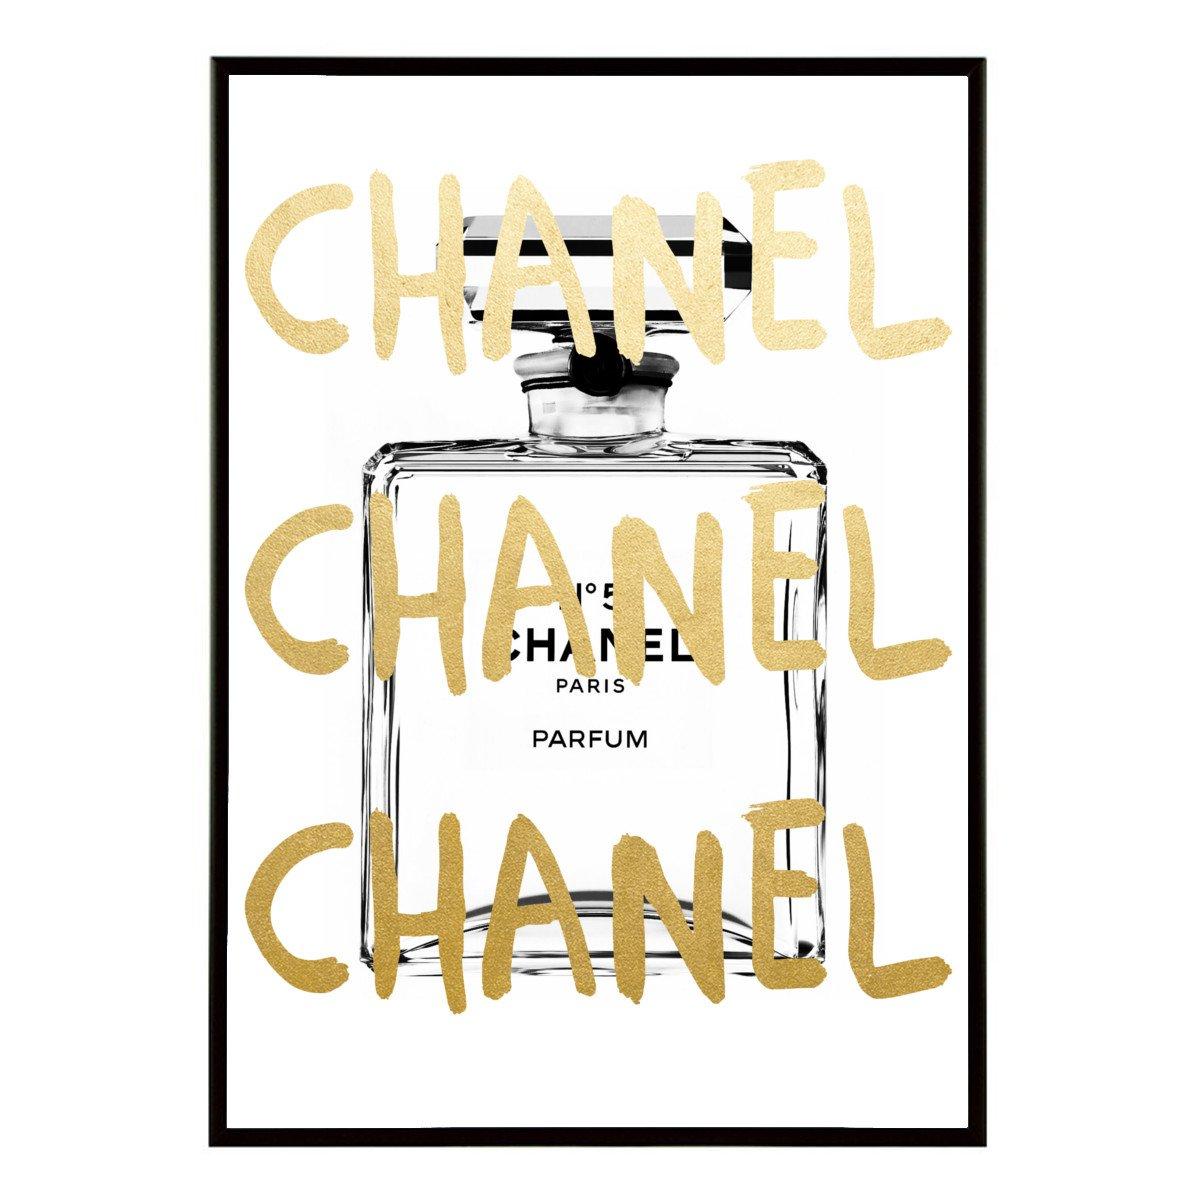 Aroma of Paris アートポスター おしゃれ インテリア 北欧 モノクロ アート #098 A1 ポスターのみ B079D52XQL A1 (594 x 841mm)|ポスターのみ ポスターのみ A1 (594 x 841mm)